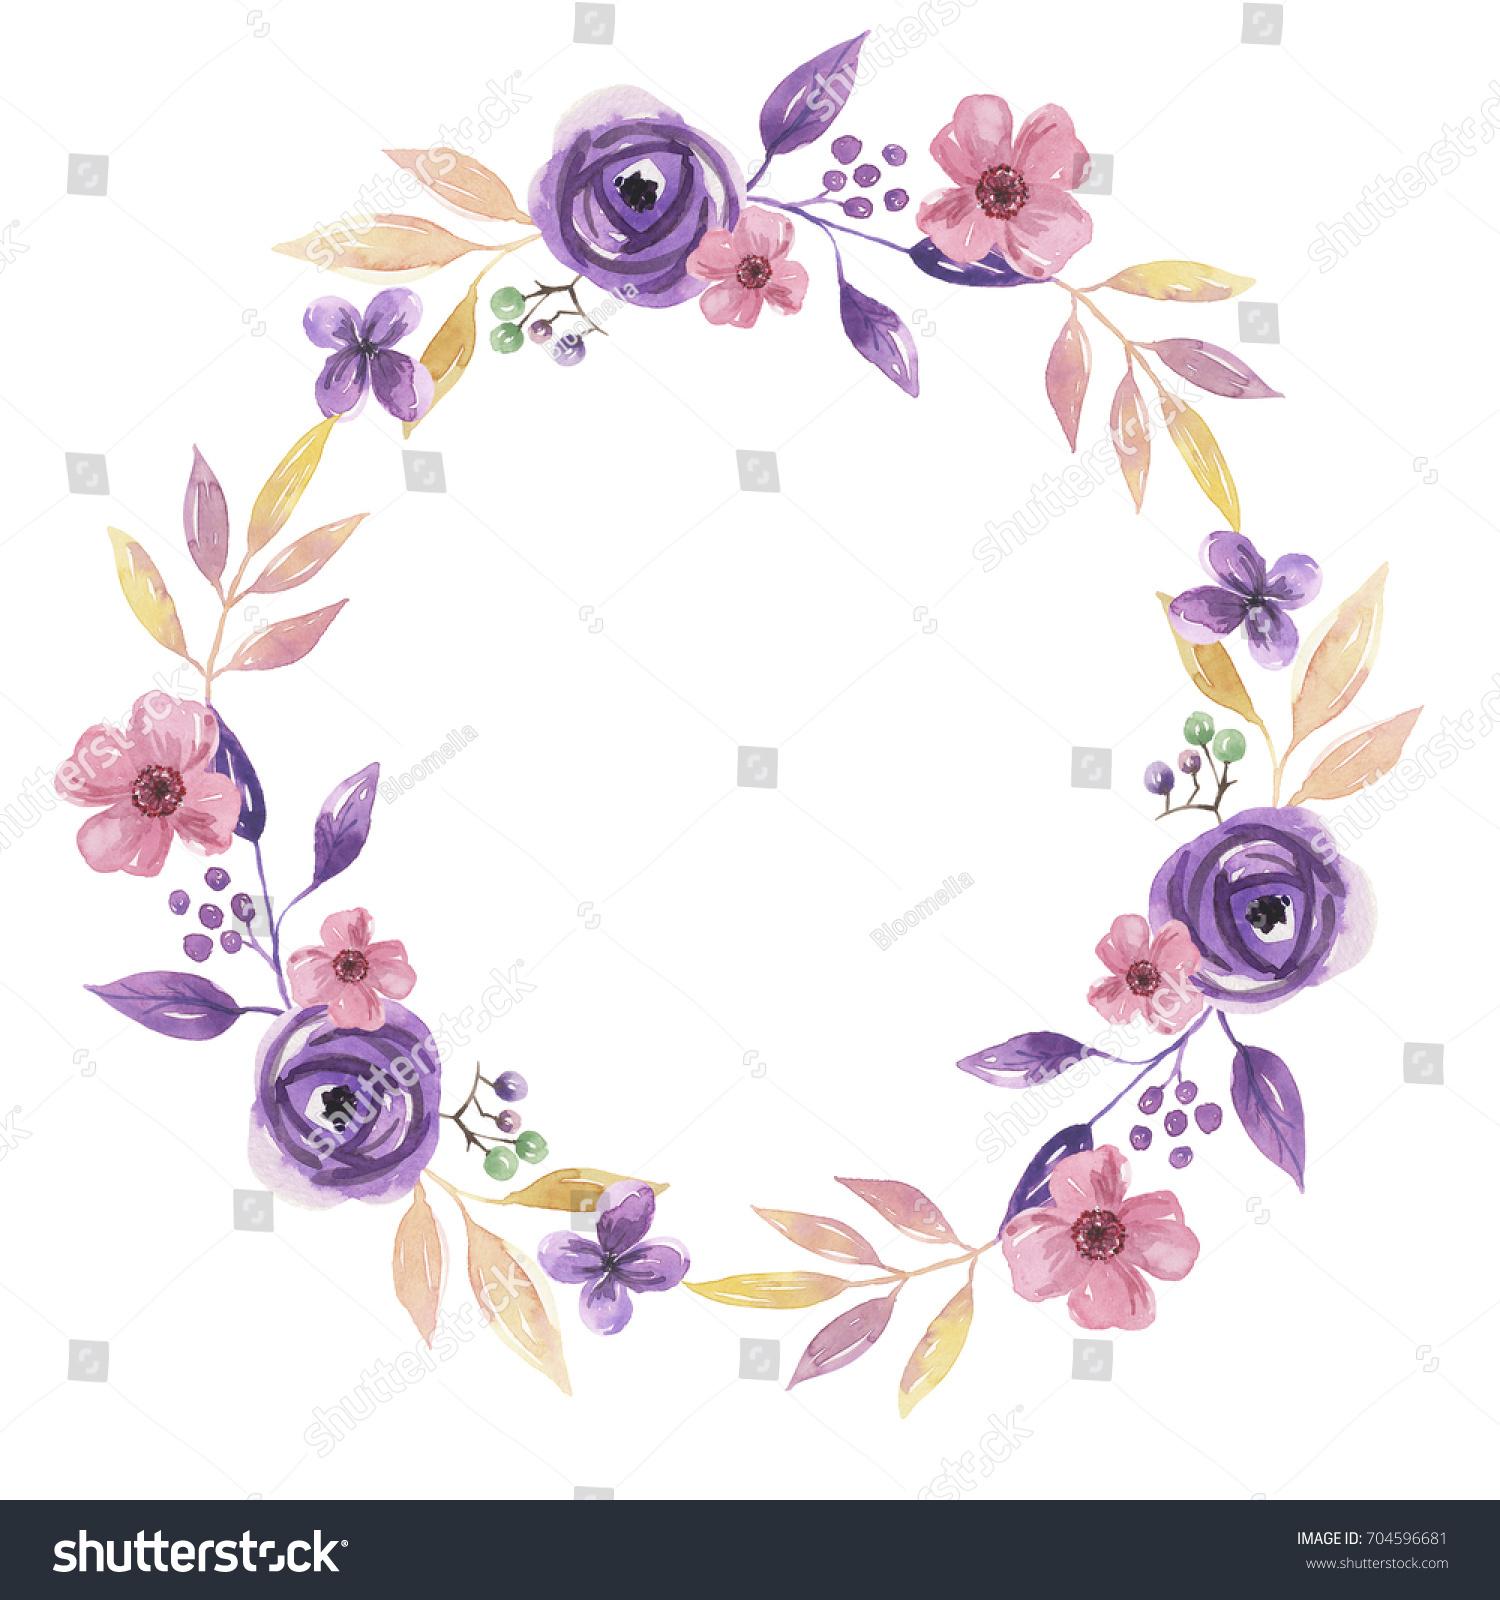 Watercolor purple pink flower wreath summer stock illustration watercolor purple pink flower wreath summer floral garland hand painted mightylinksfo